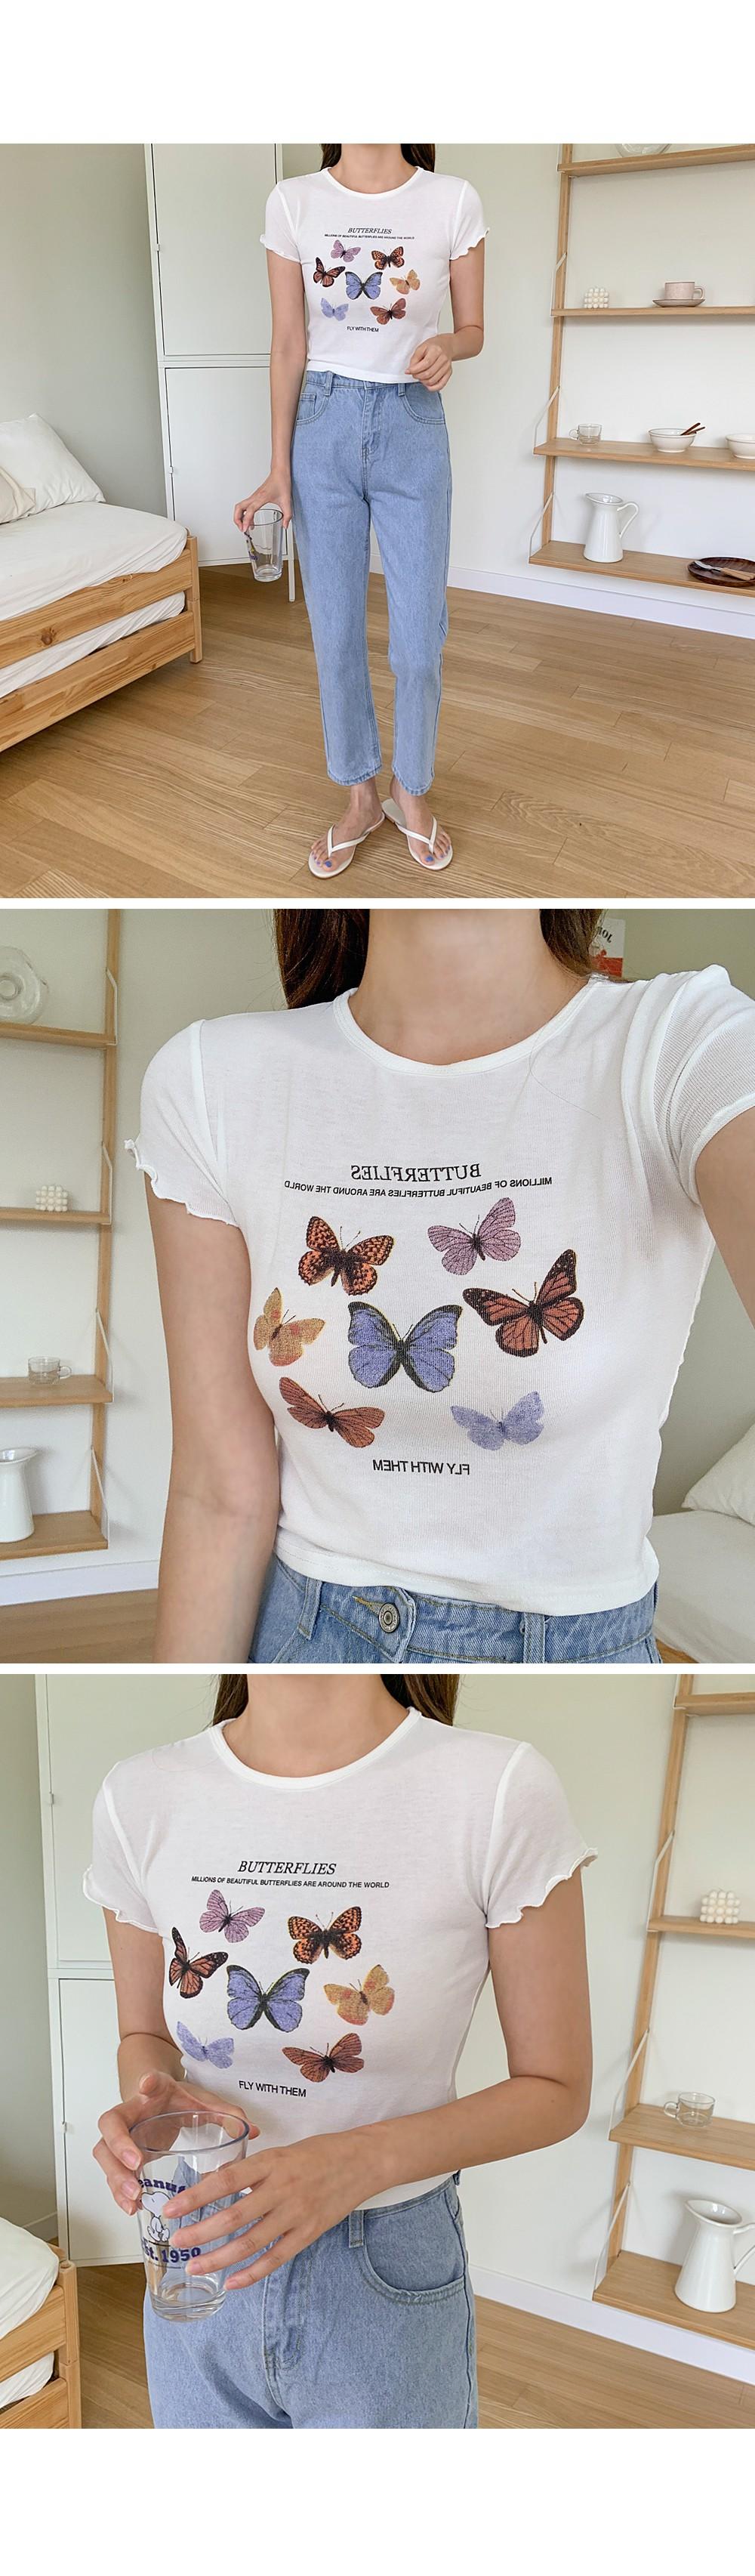 ★Normal trend★Butterfly crop T